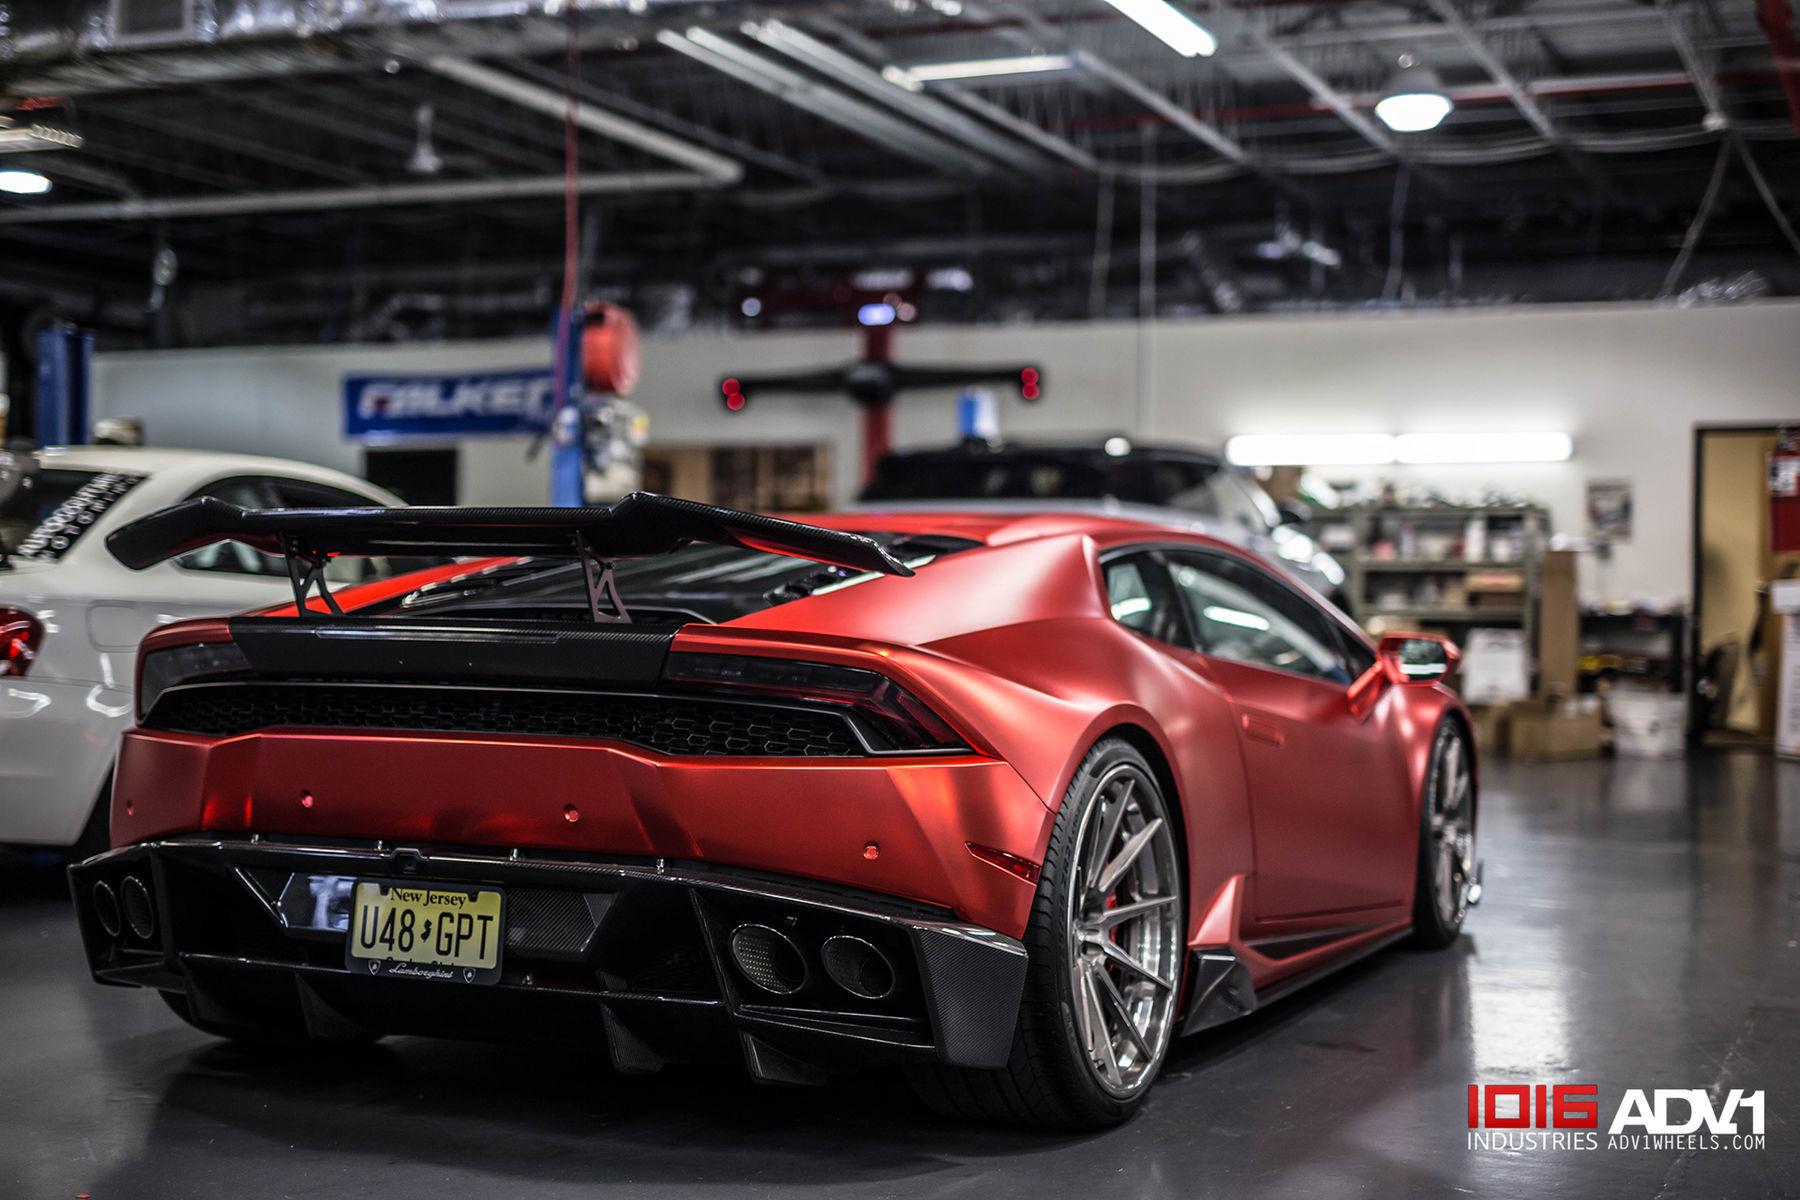 2017 Lamborghini Huracan | Satin Metallic Red Lamborghini Huracan LP610-4